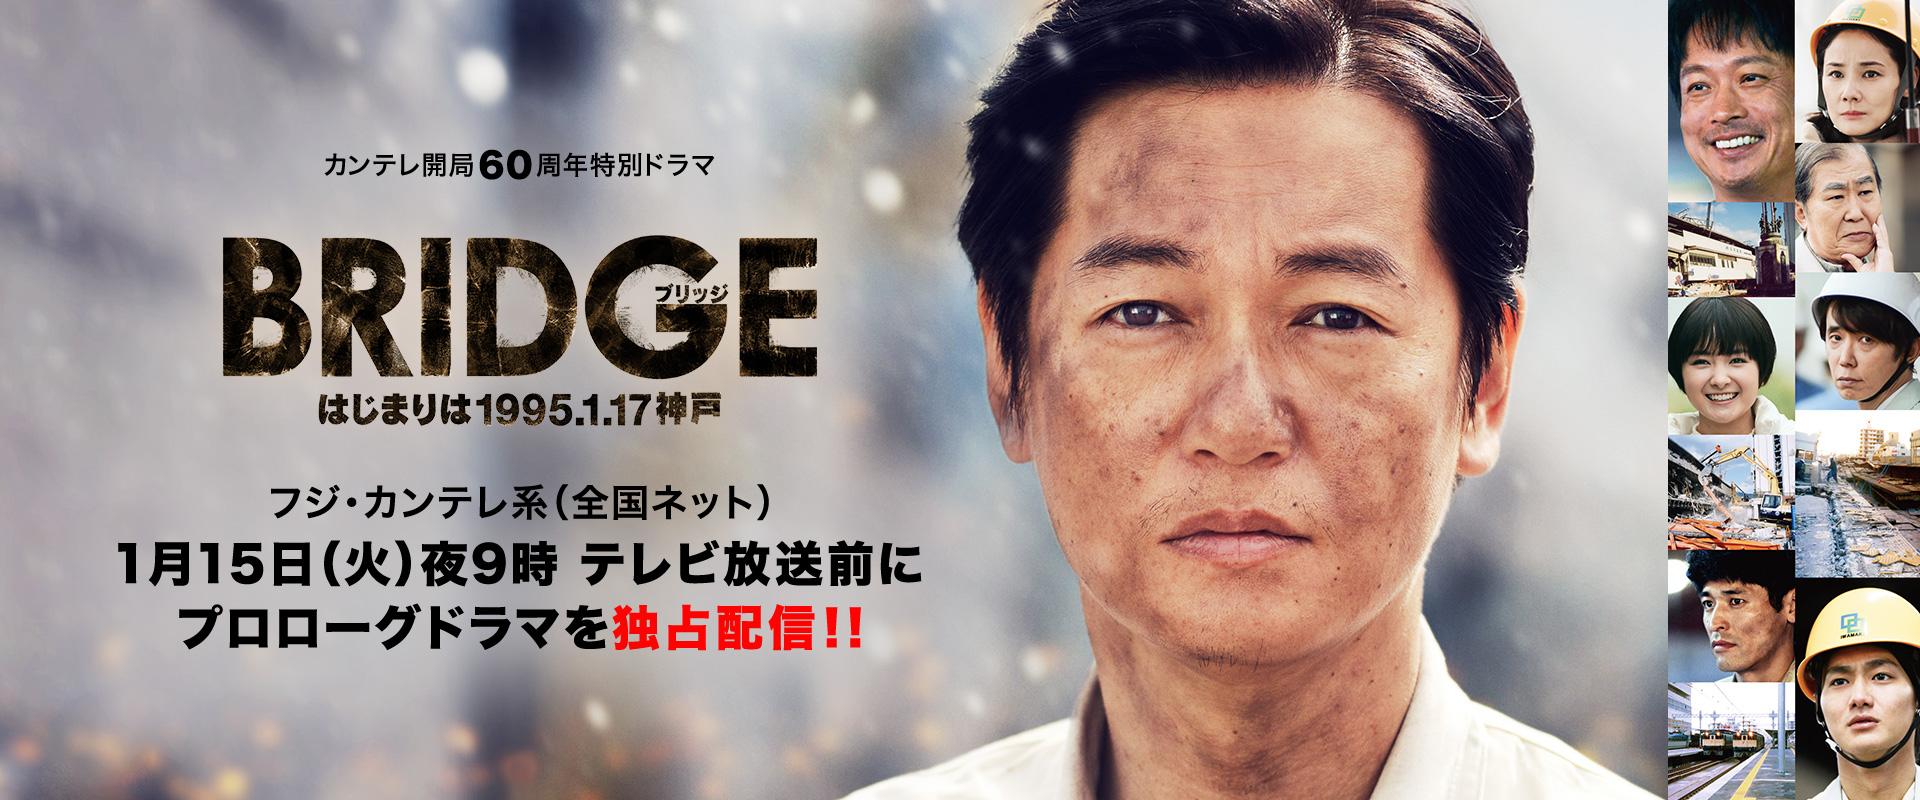 BRIDGEはじまりは1995.1.17神戸の地上波放送日や再放送とロケ地を調査!